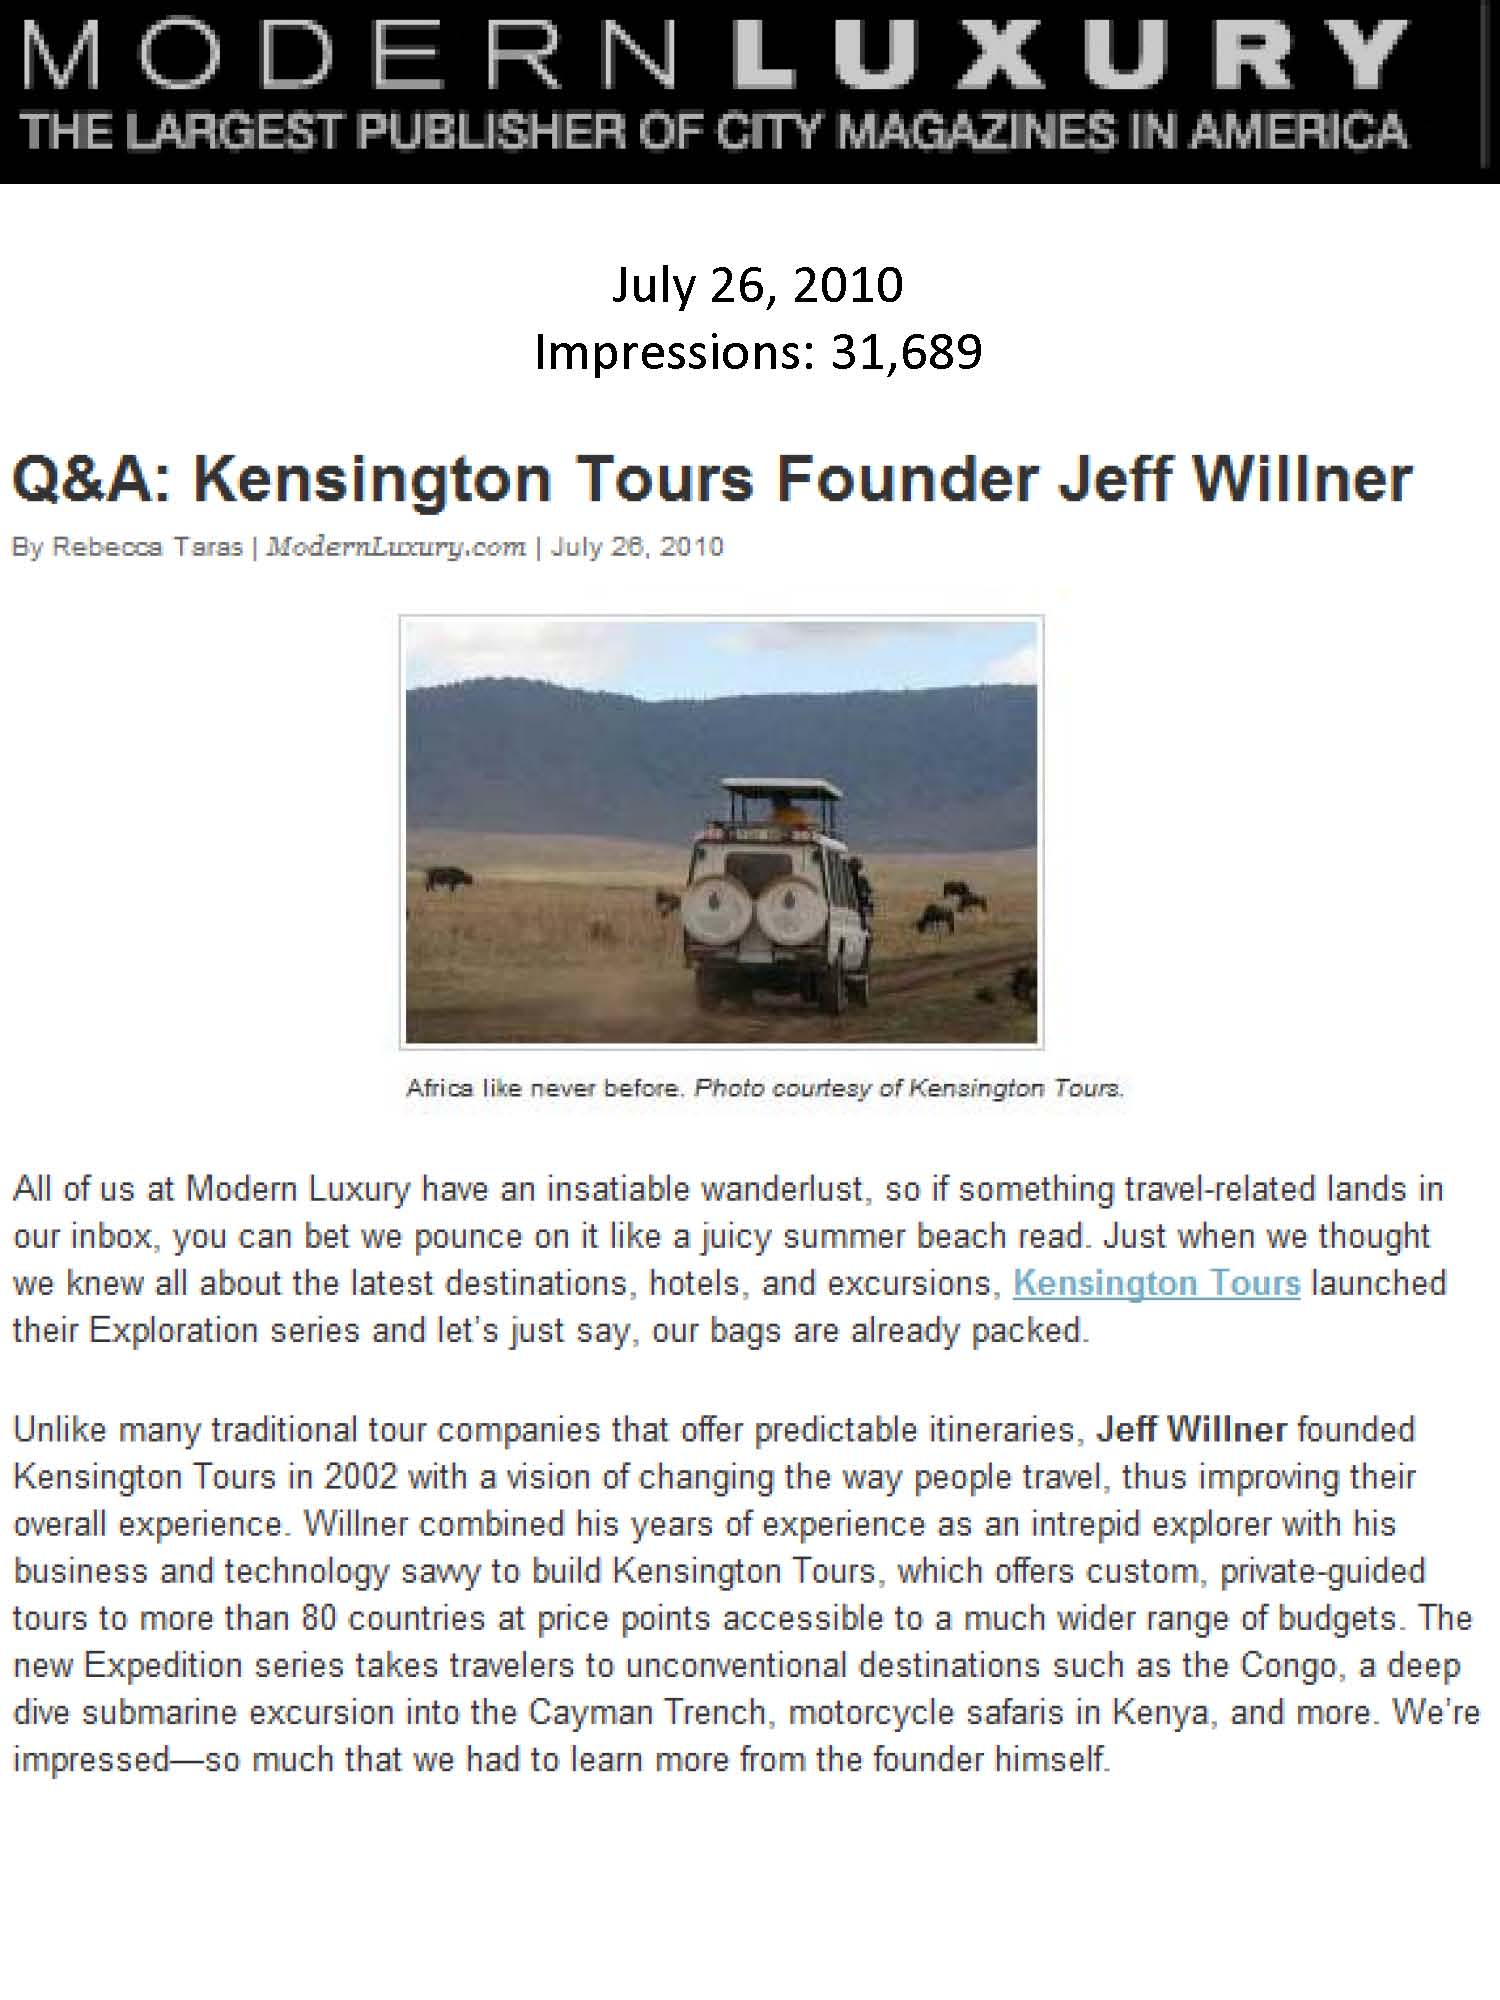 KT's Expedition Series on ModernLuxury.com